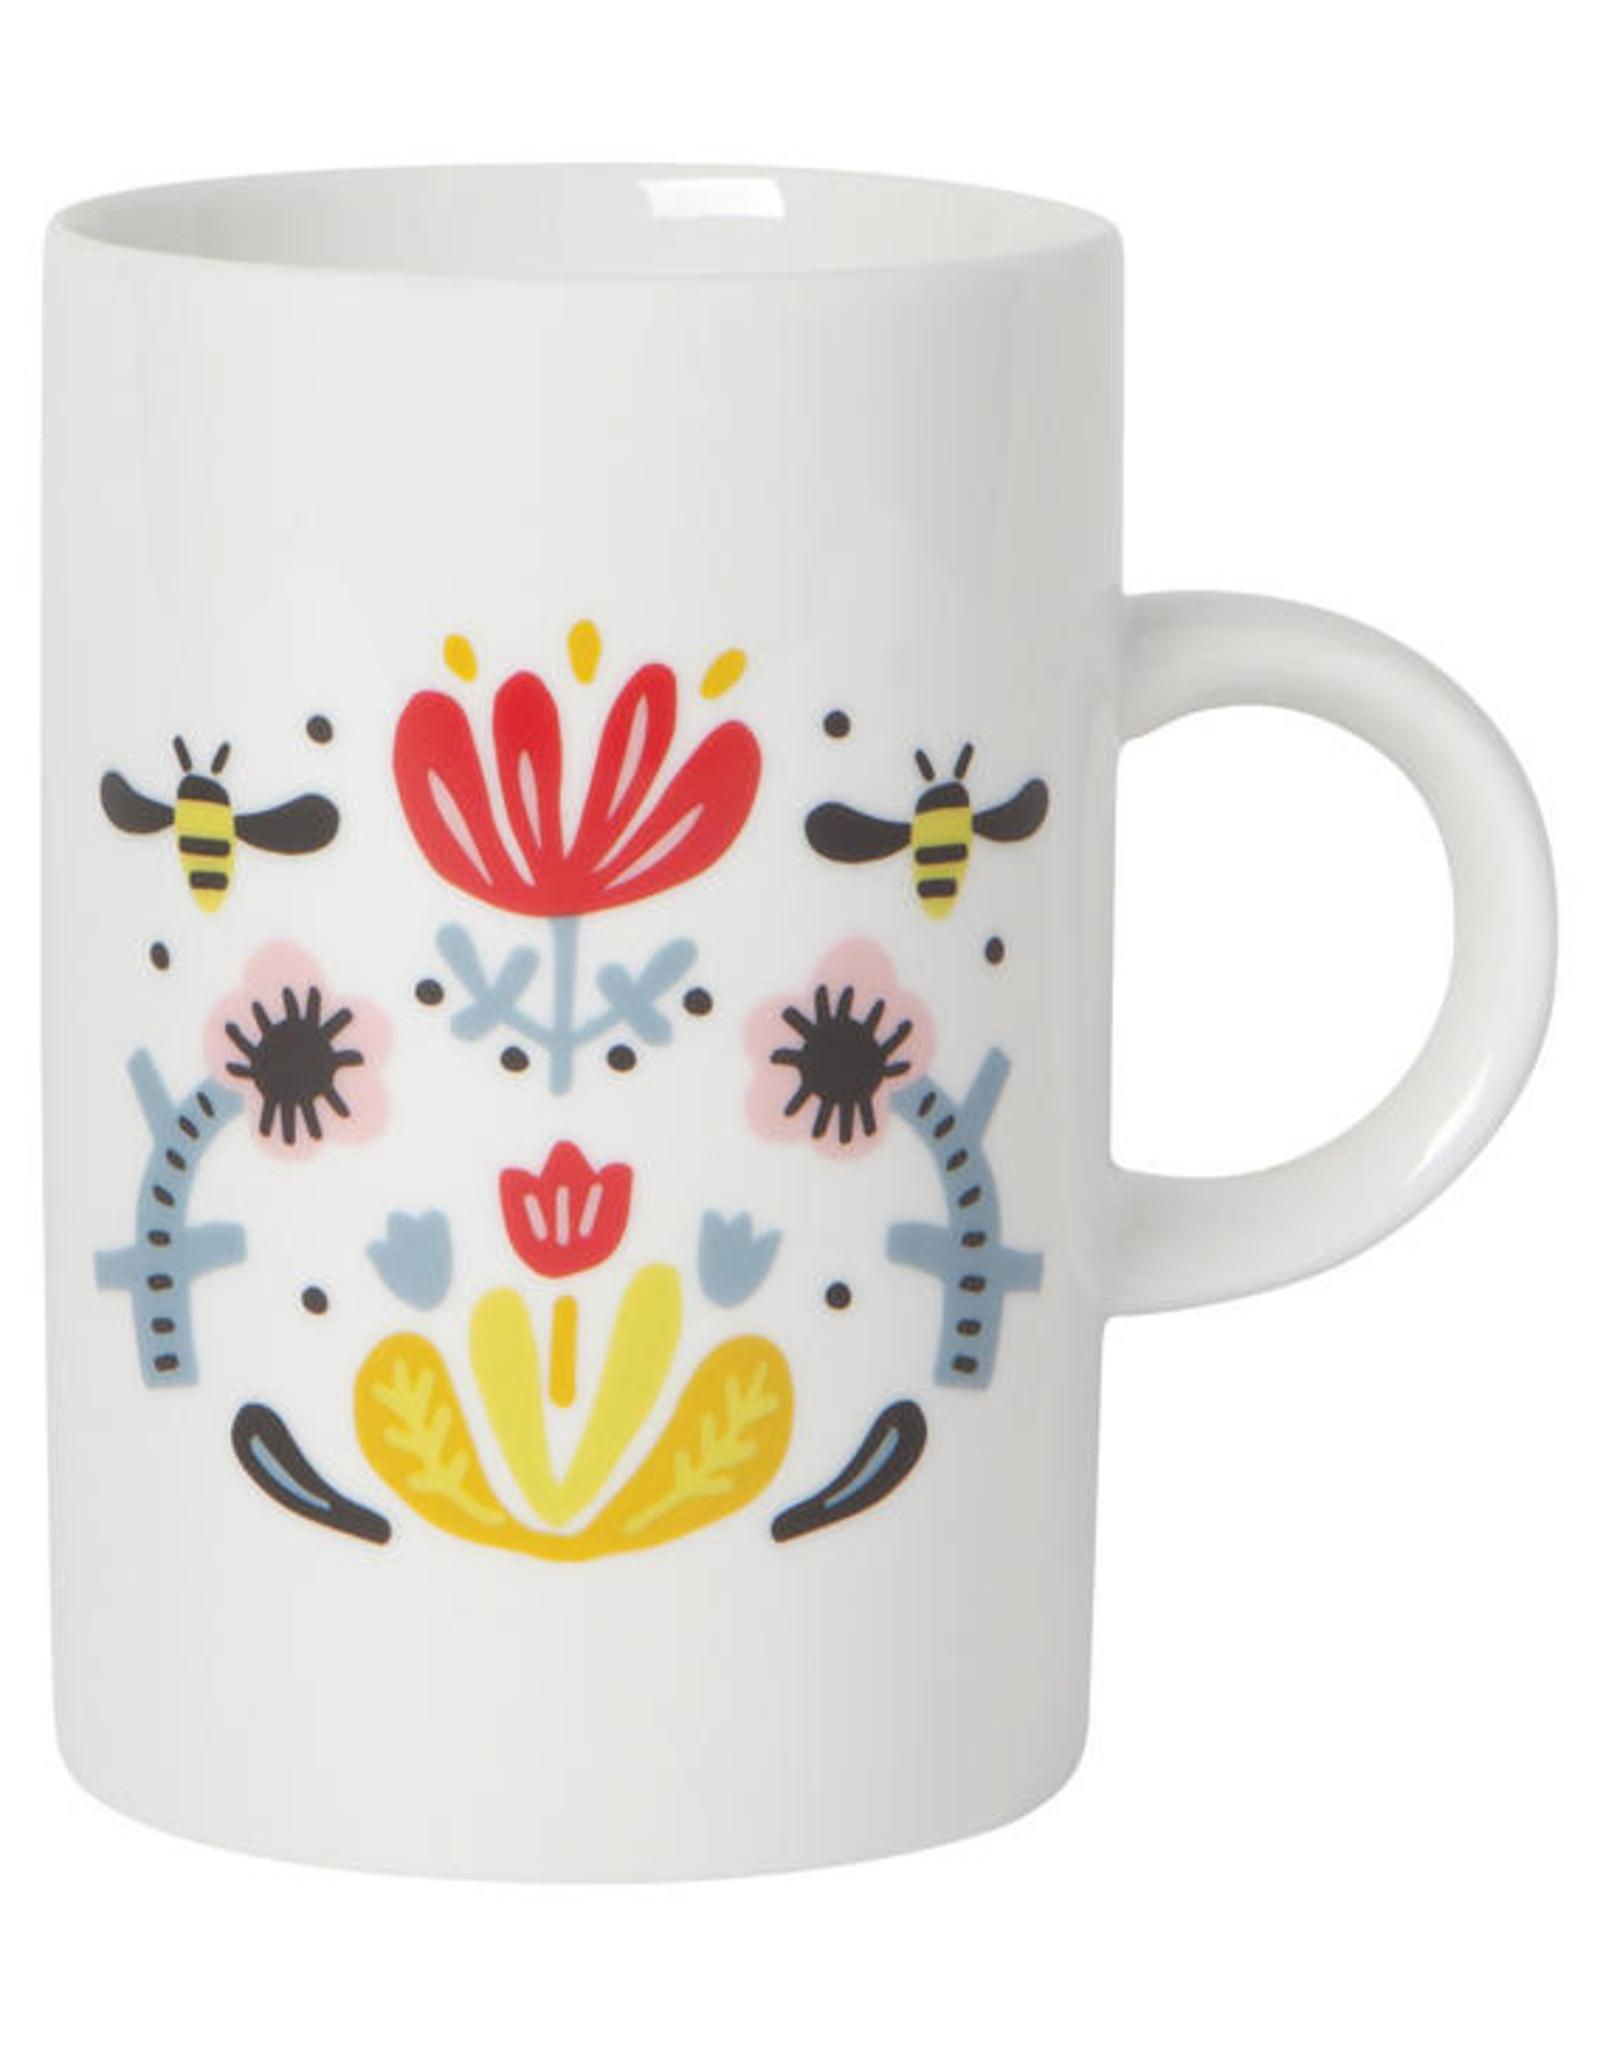 DCA - Folklore Mug